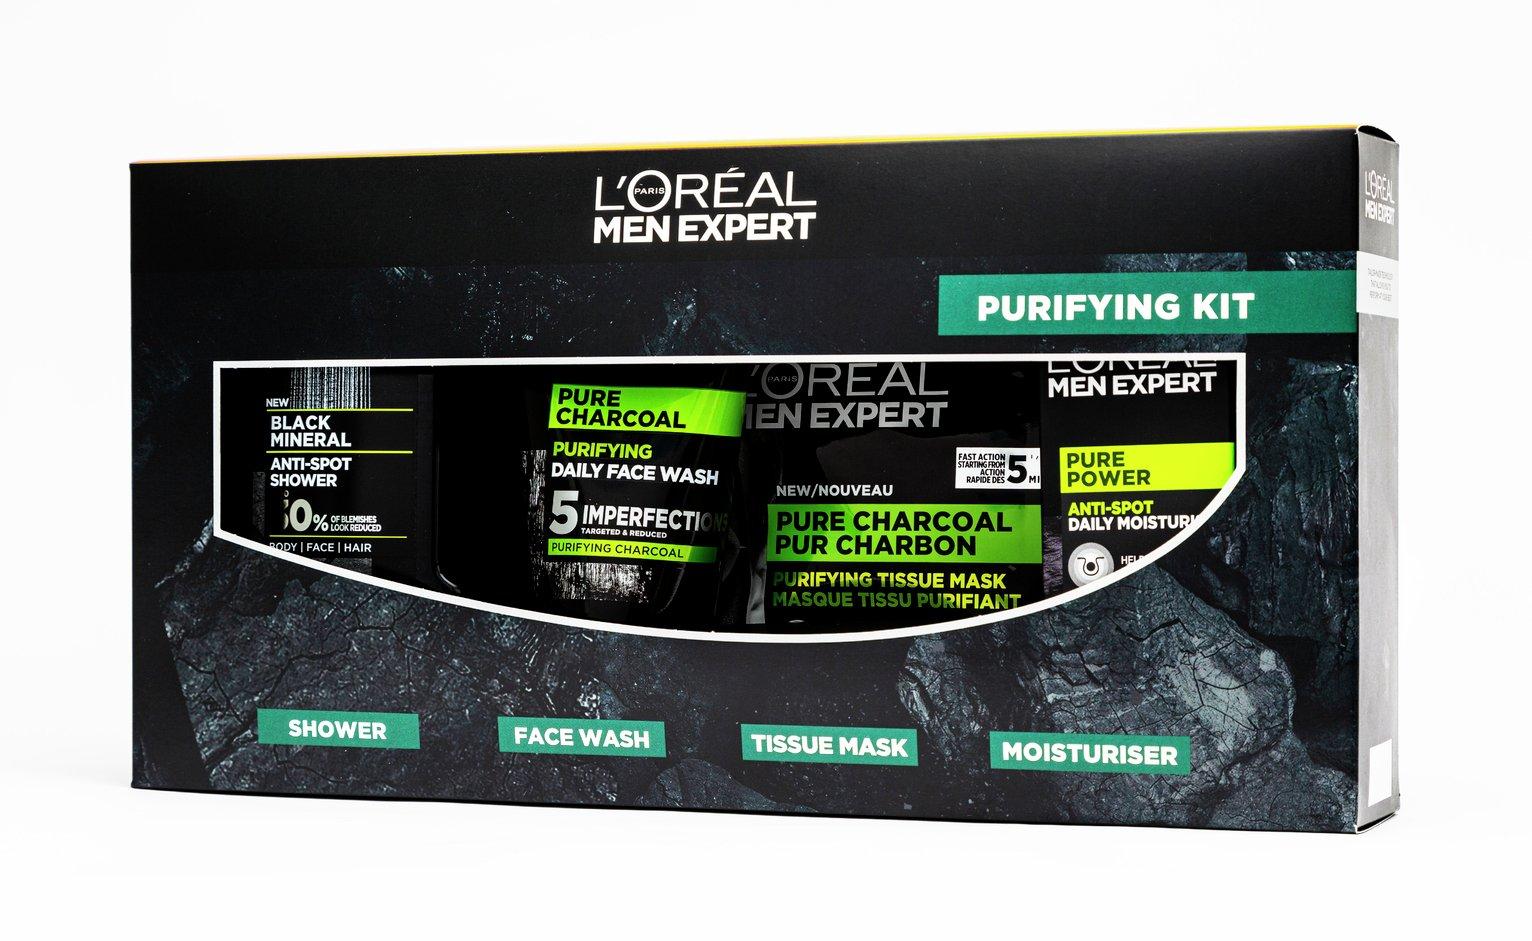 L'Oreal Paris Men Expert Purifying Kit